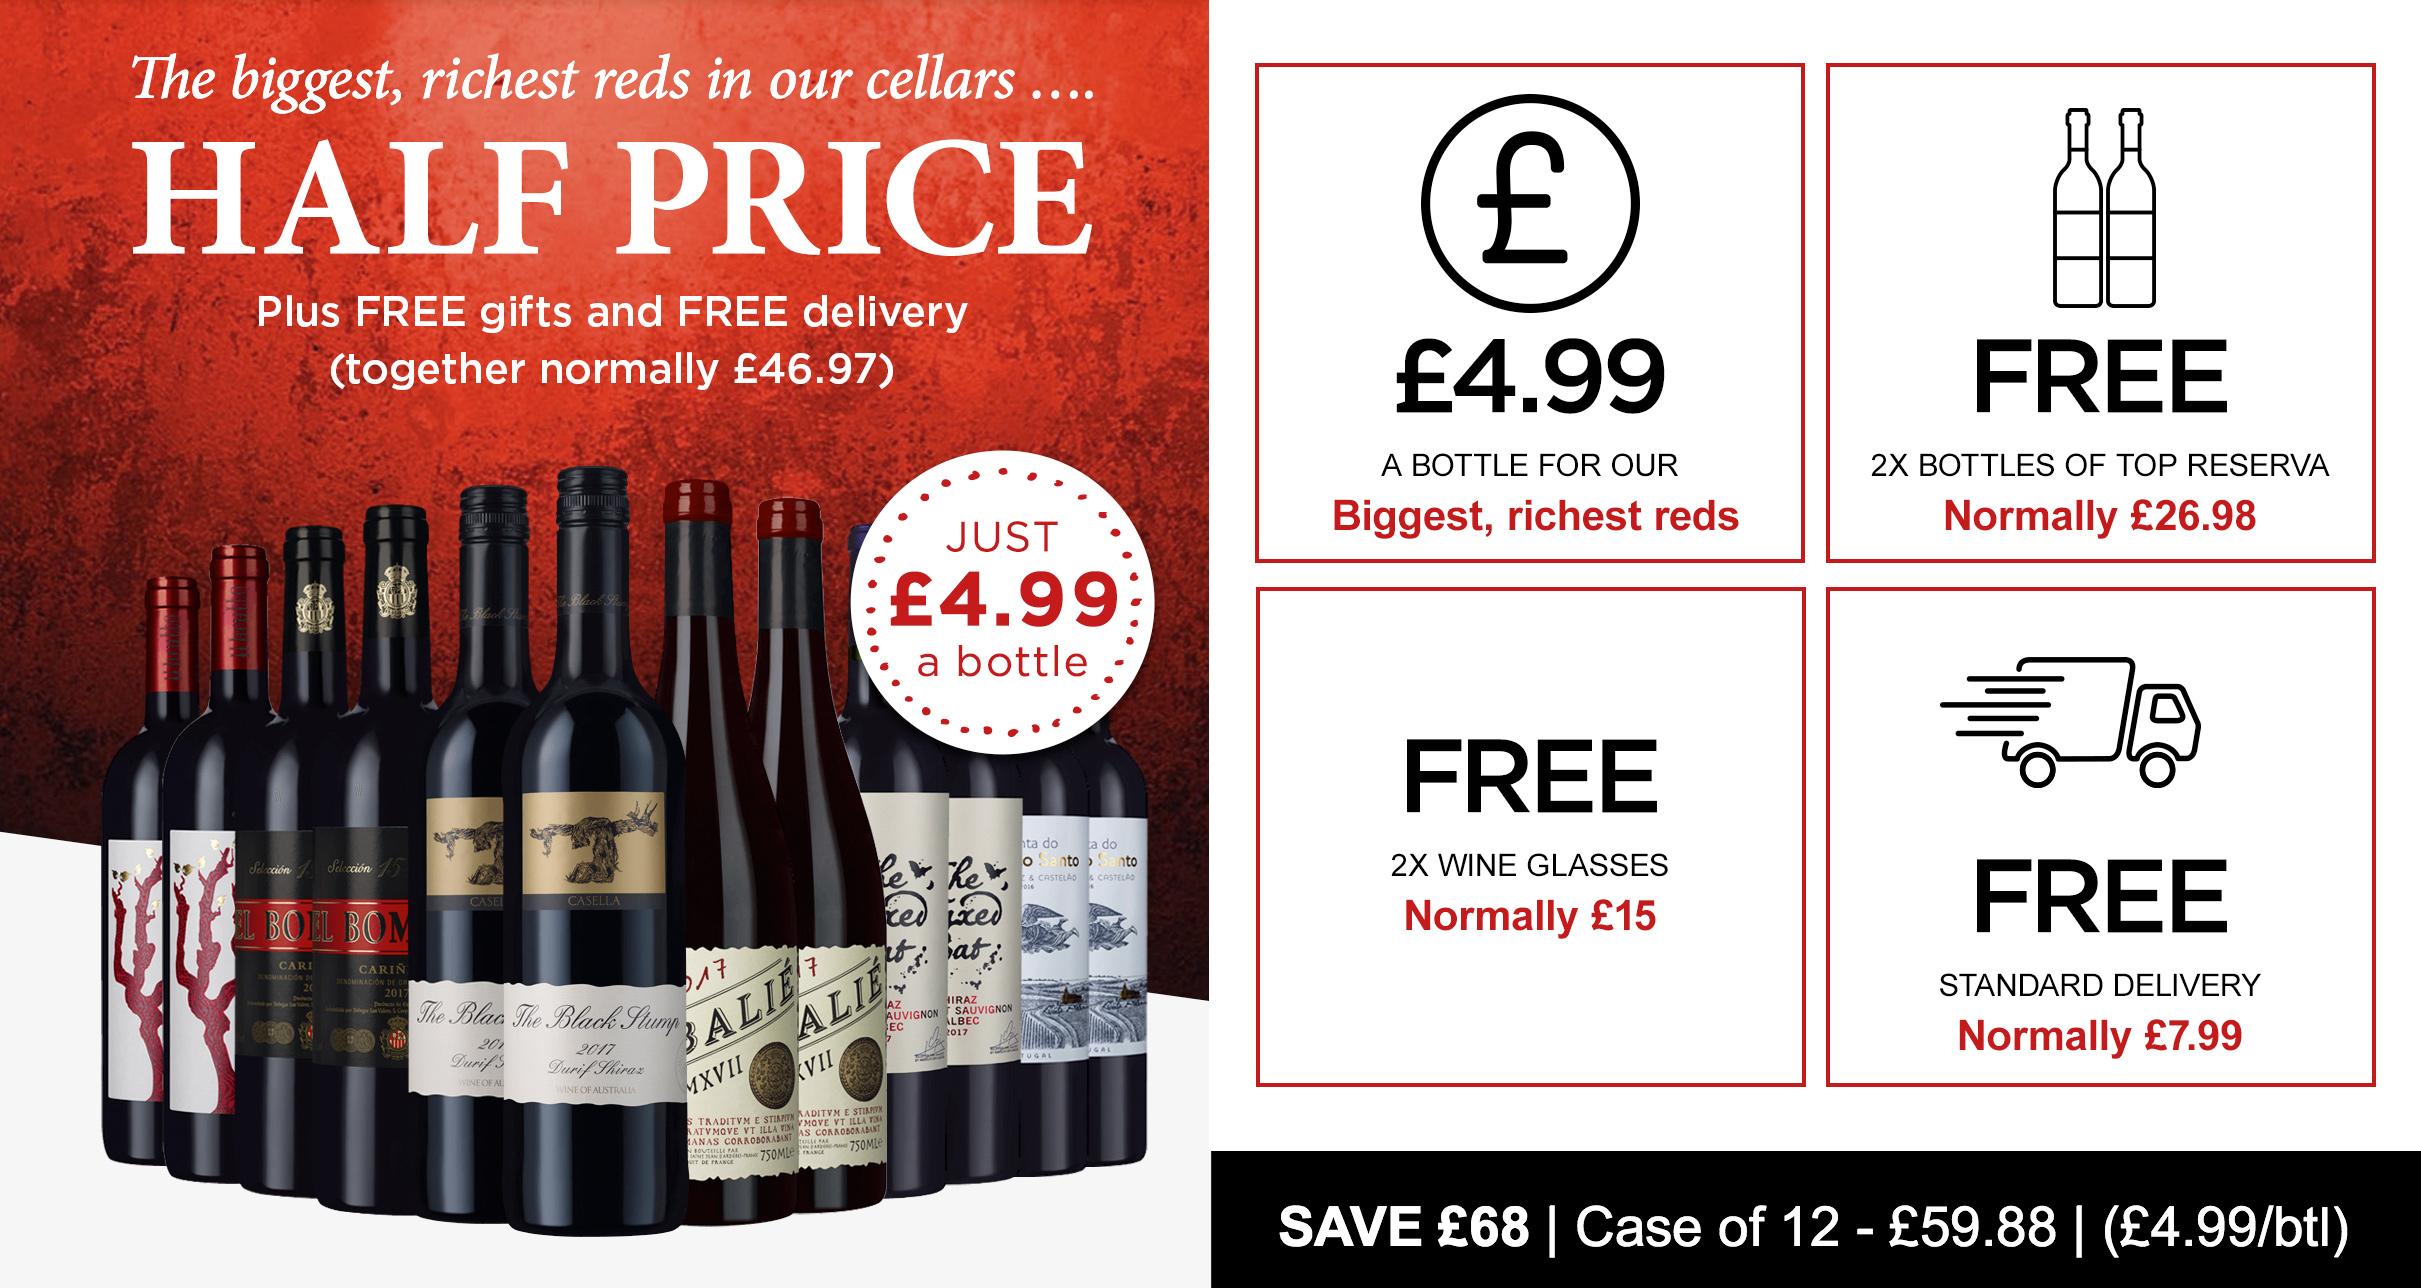 Half price case of red wine + 2 free bottles of rioja + 2 free wine glasses + free delivery - £59.98 @ Laithwaites